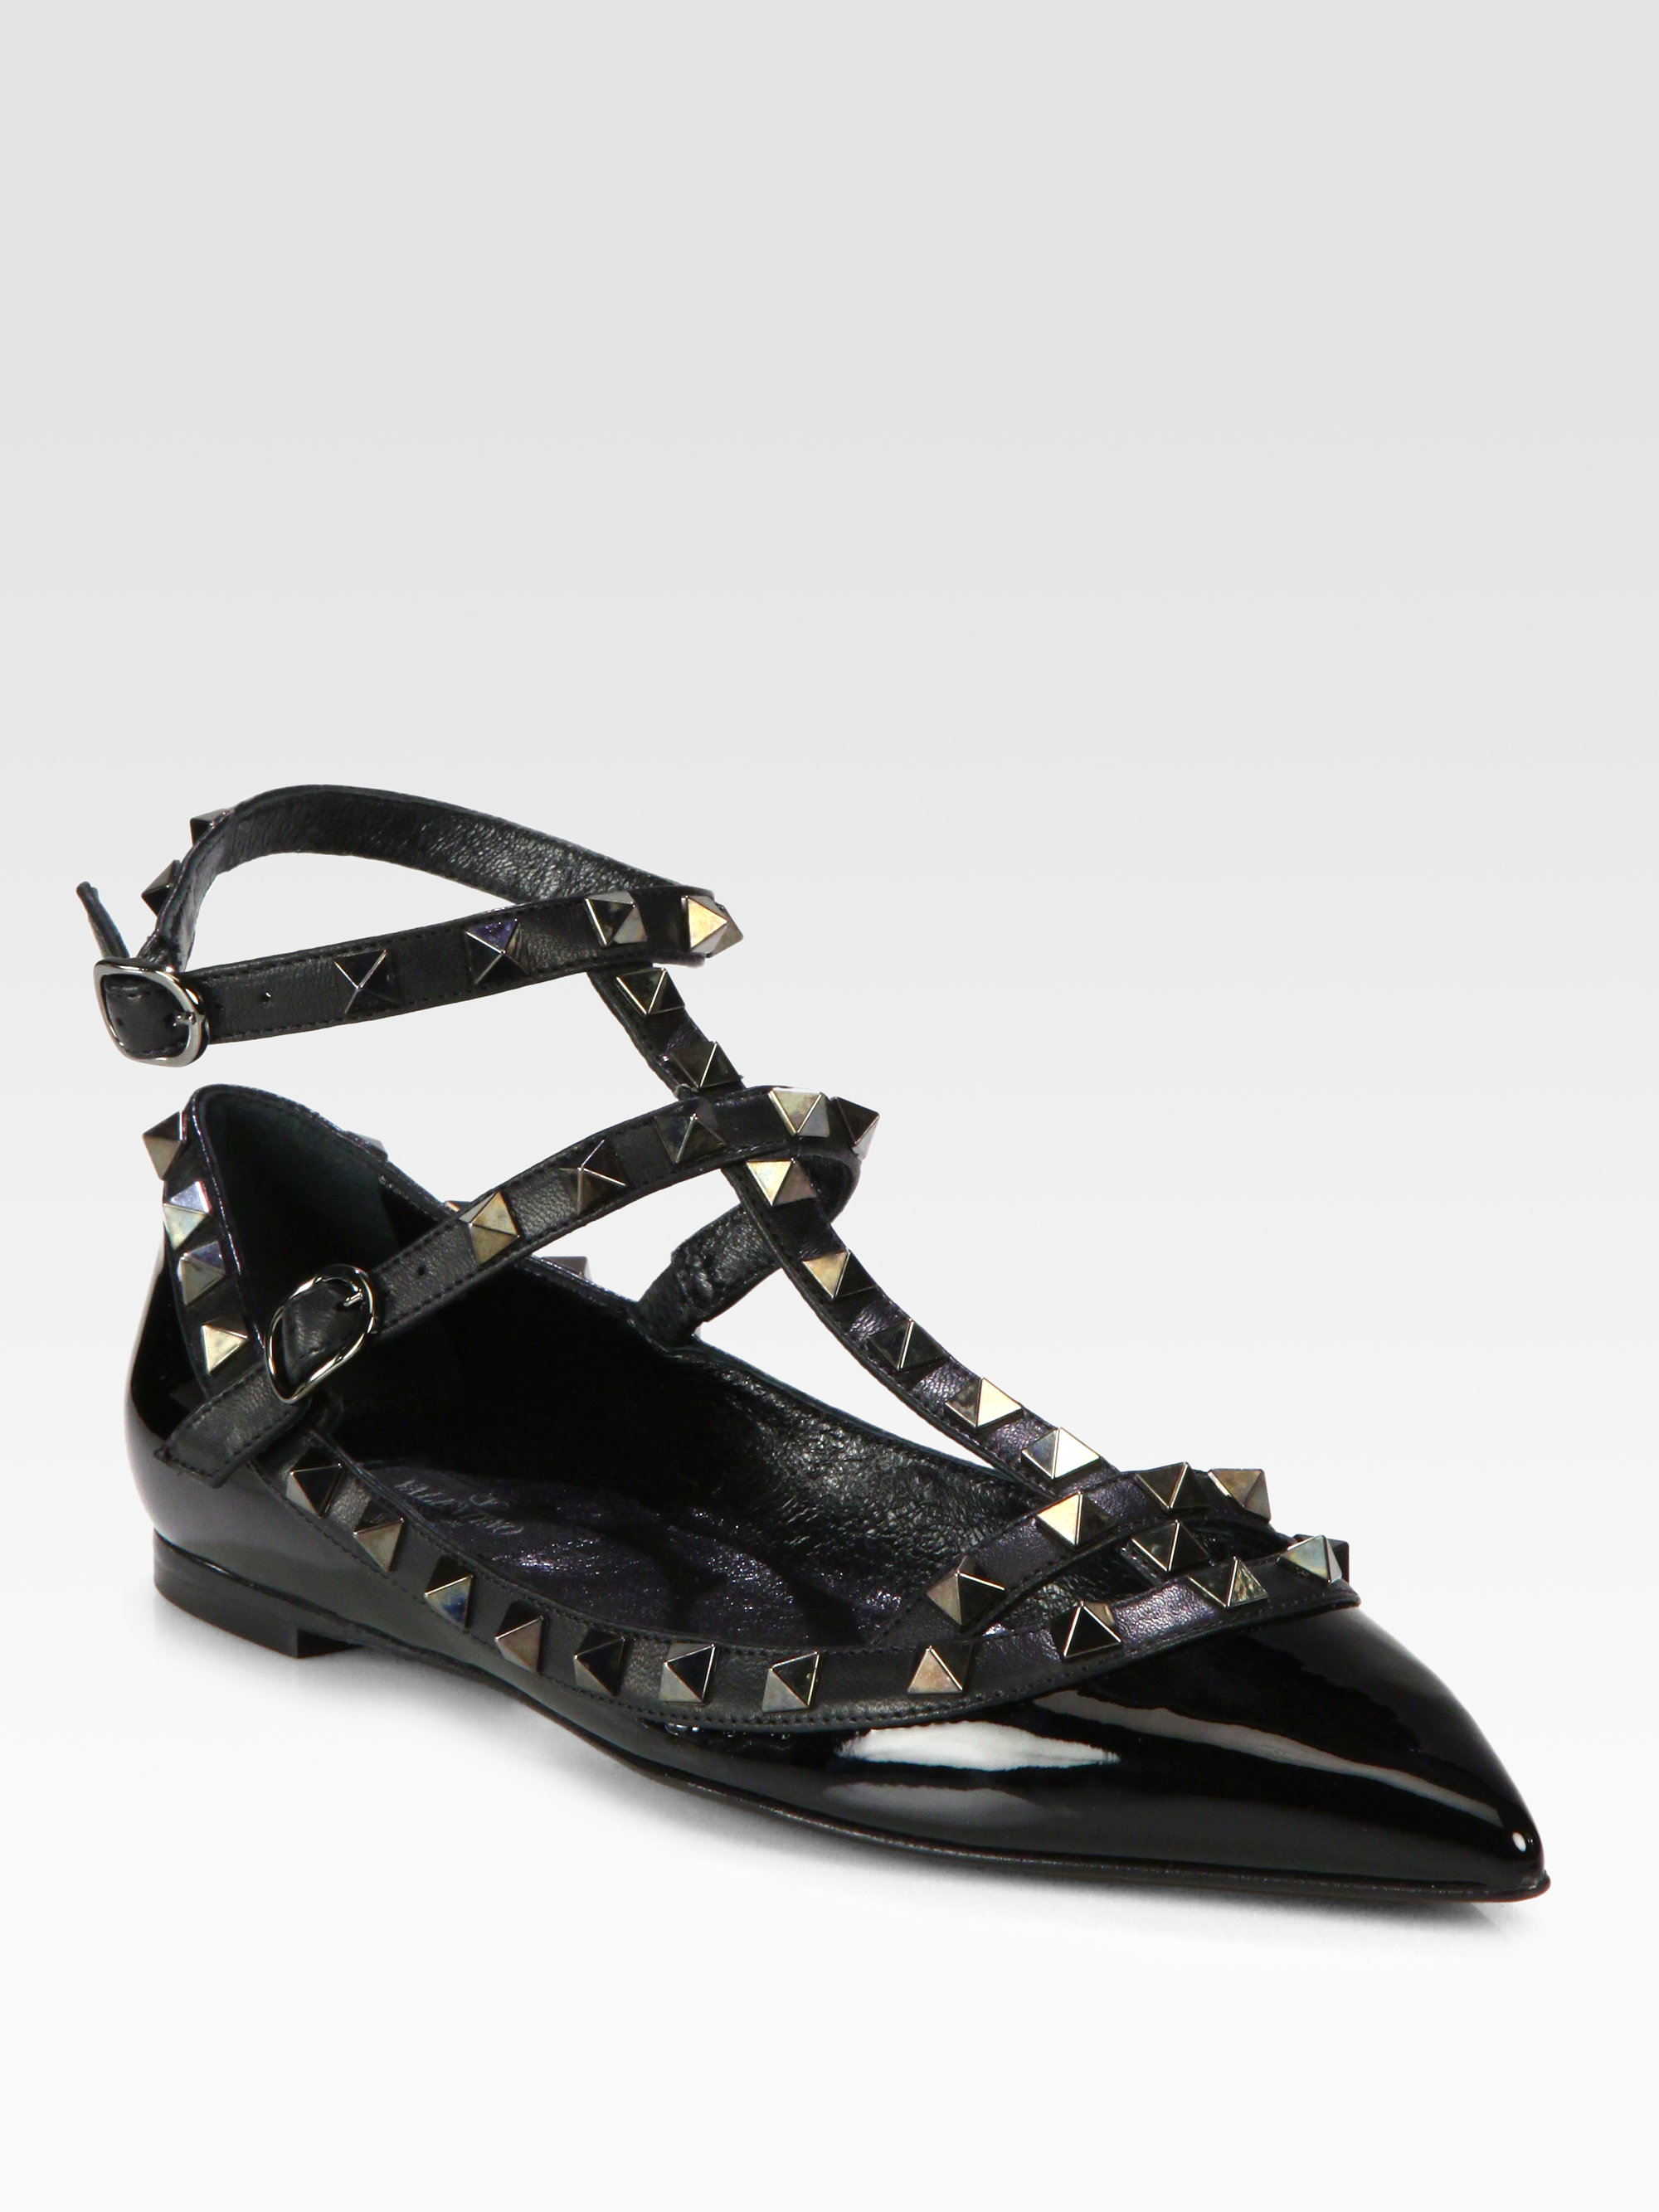 Valentino Rockstud Patent Leather Tstrap Flats In Black Lyst